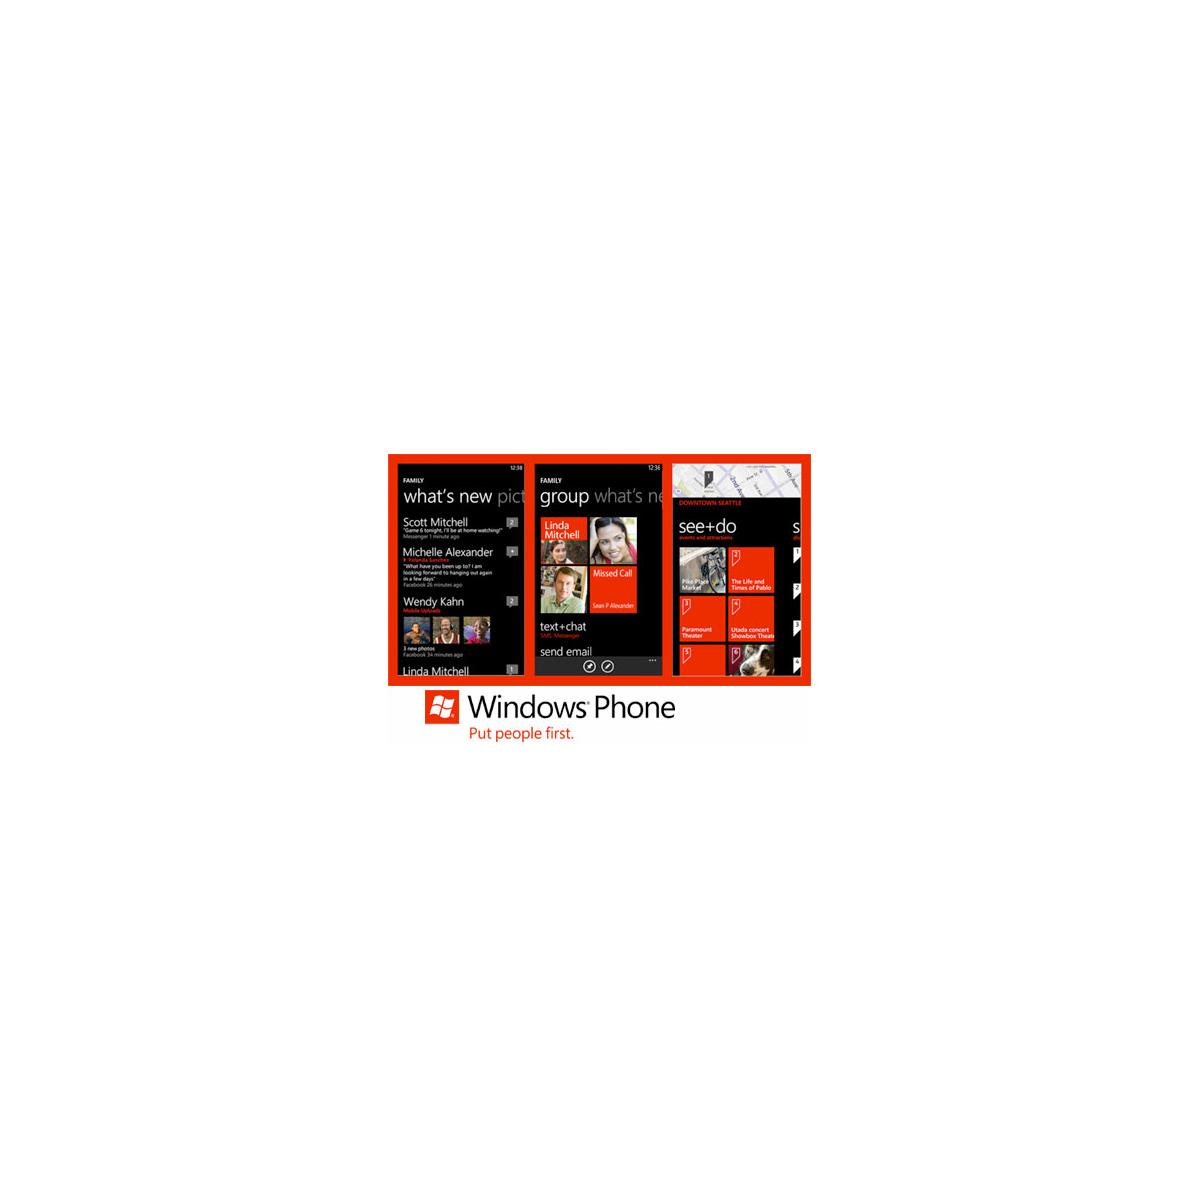 Microsoft Begins Windows Phone 7 5 (Mango) Update Rollout